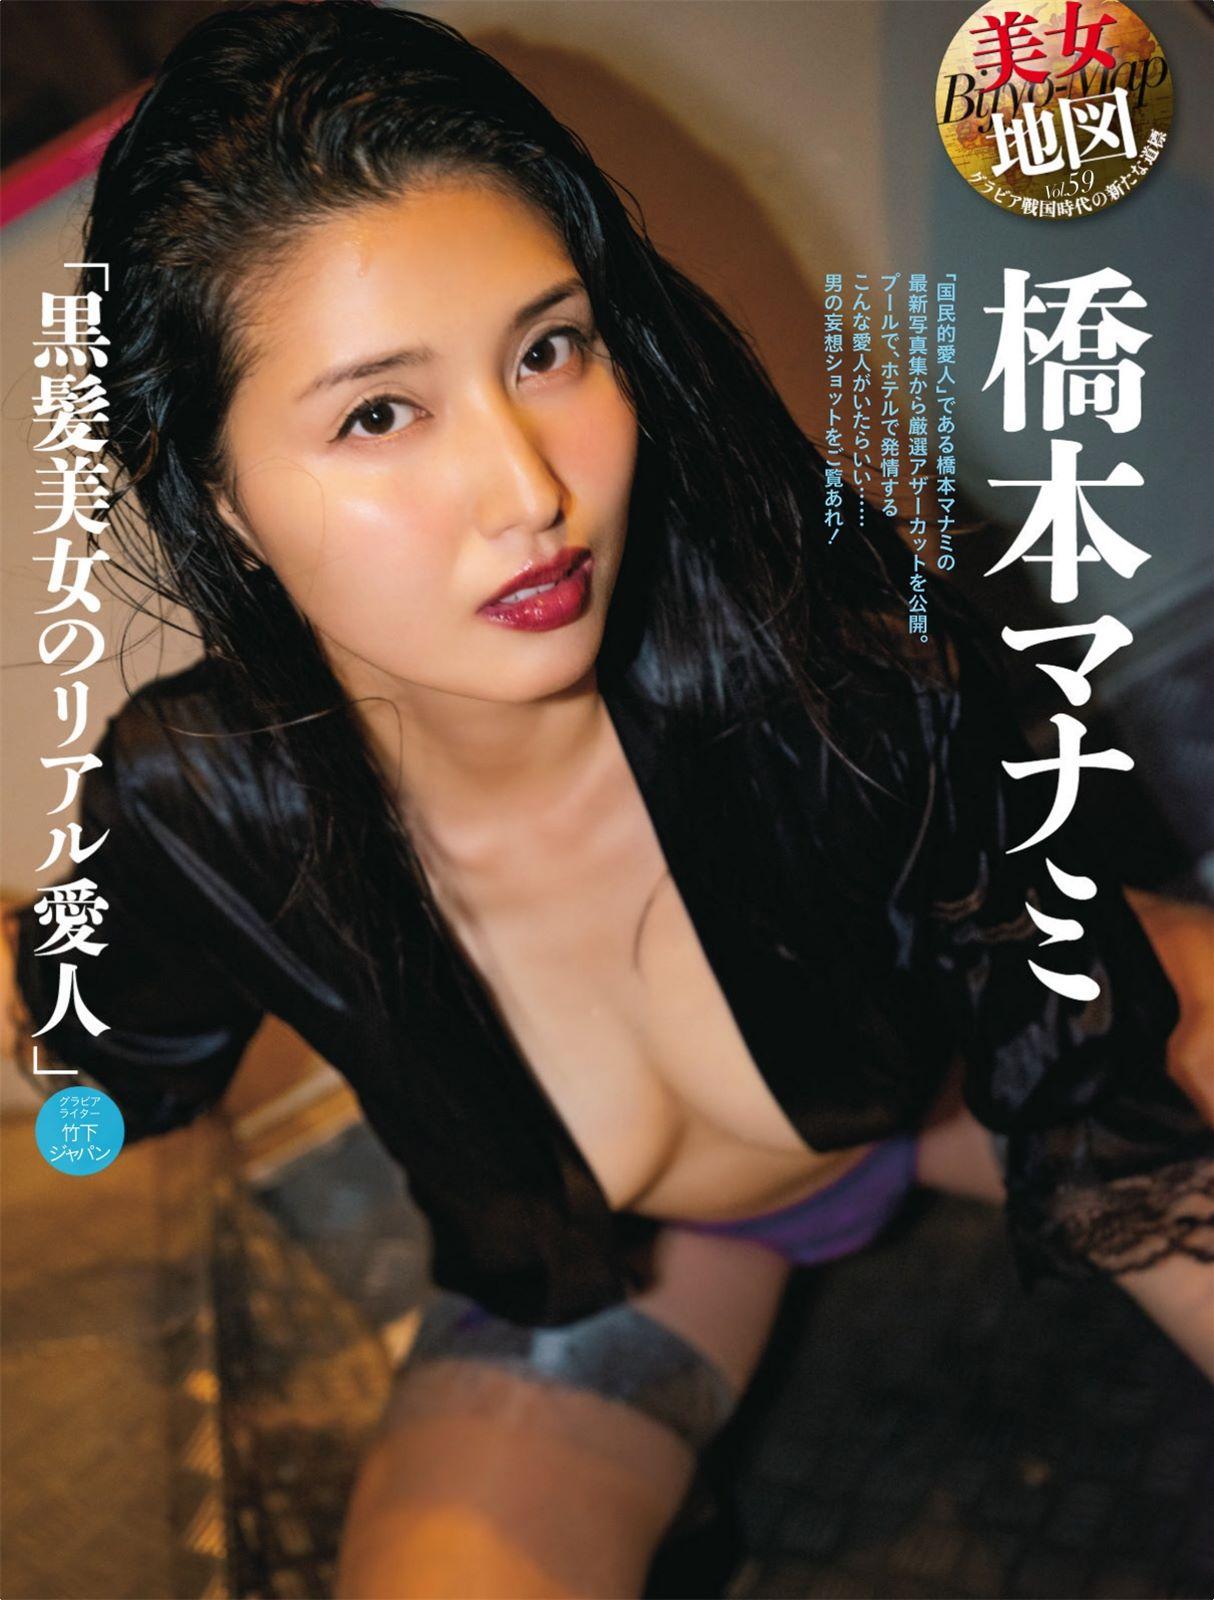 Manami Hashimoto 橋本マナミ, Shukan SPA! 2017.10.10 (週刊スパ 2017年10月10日号)